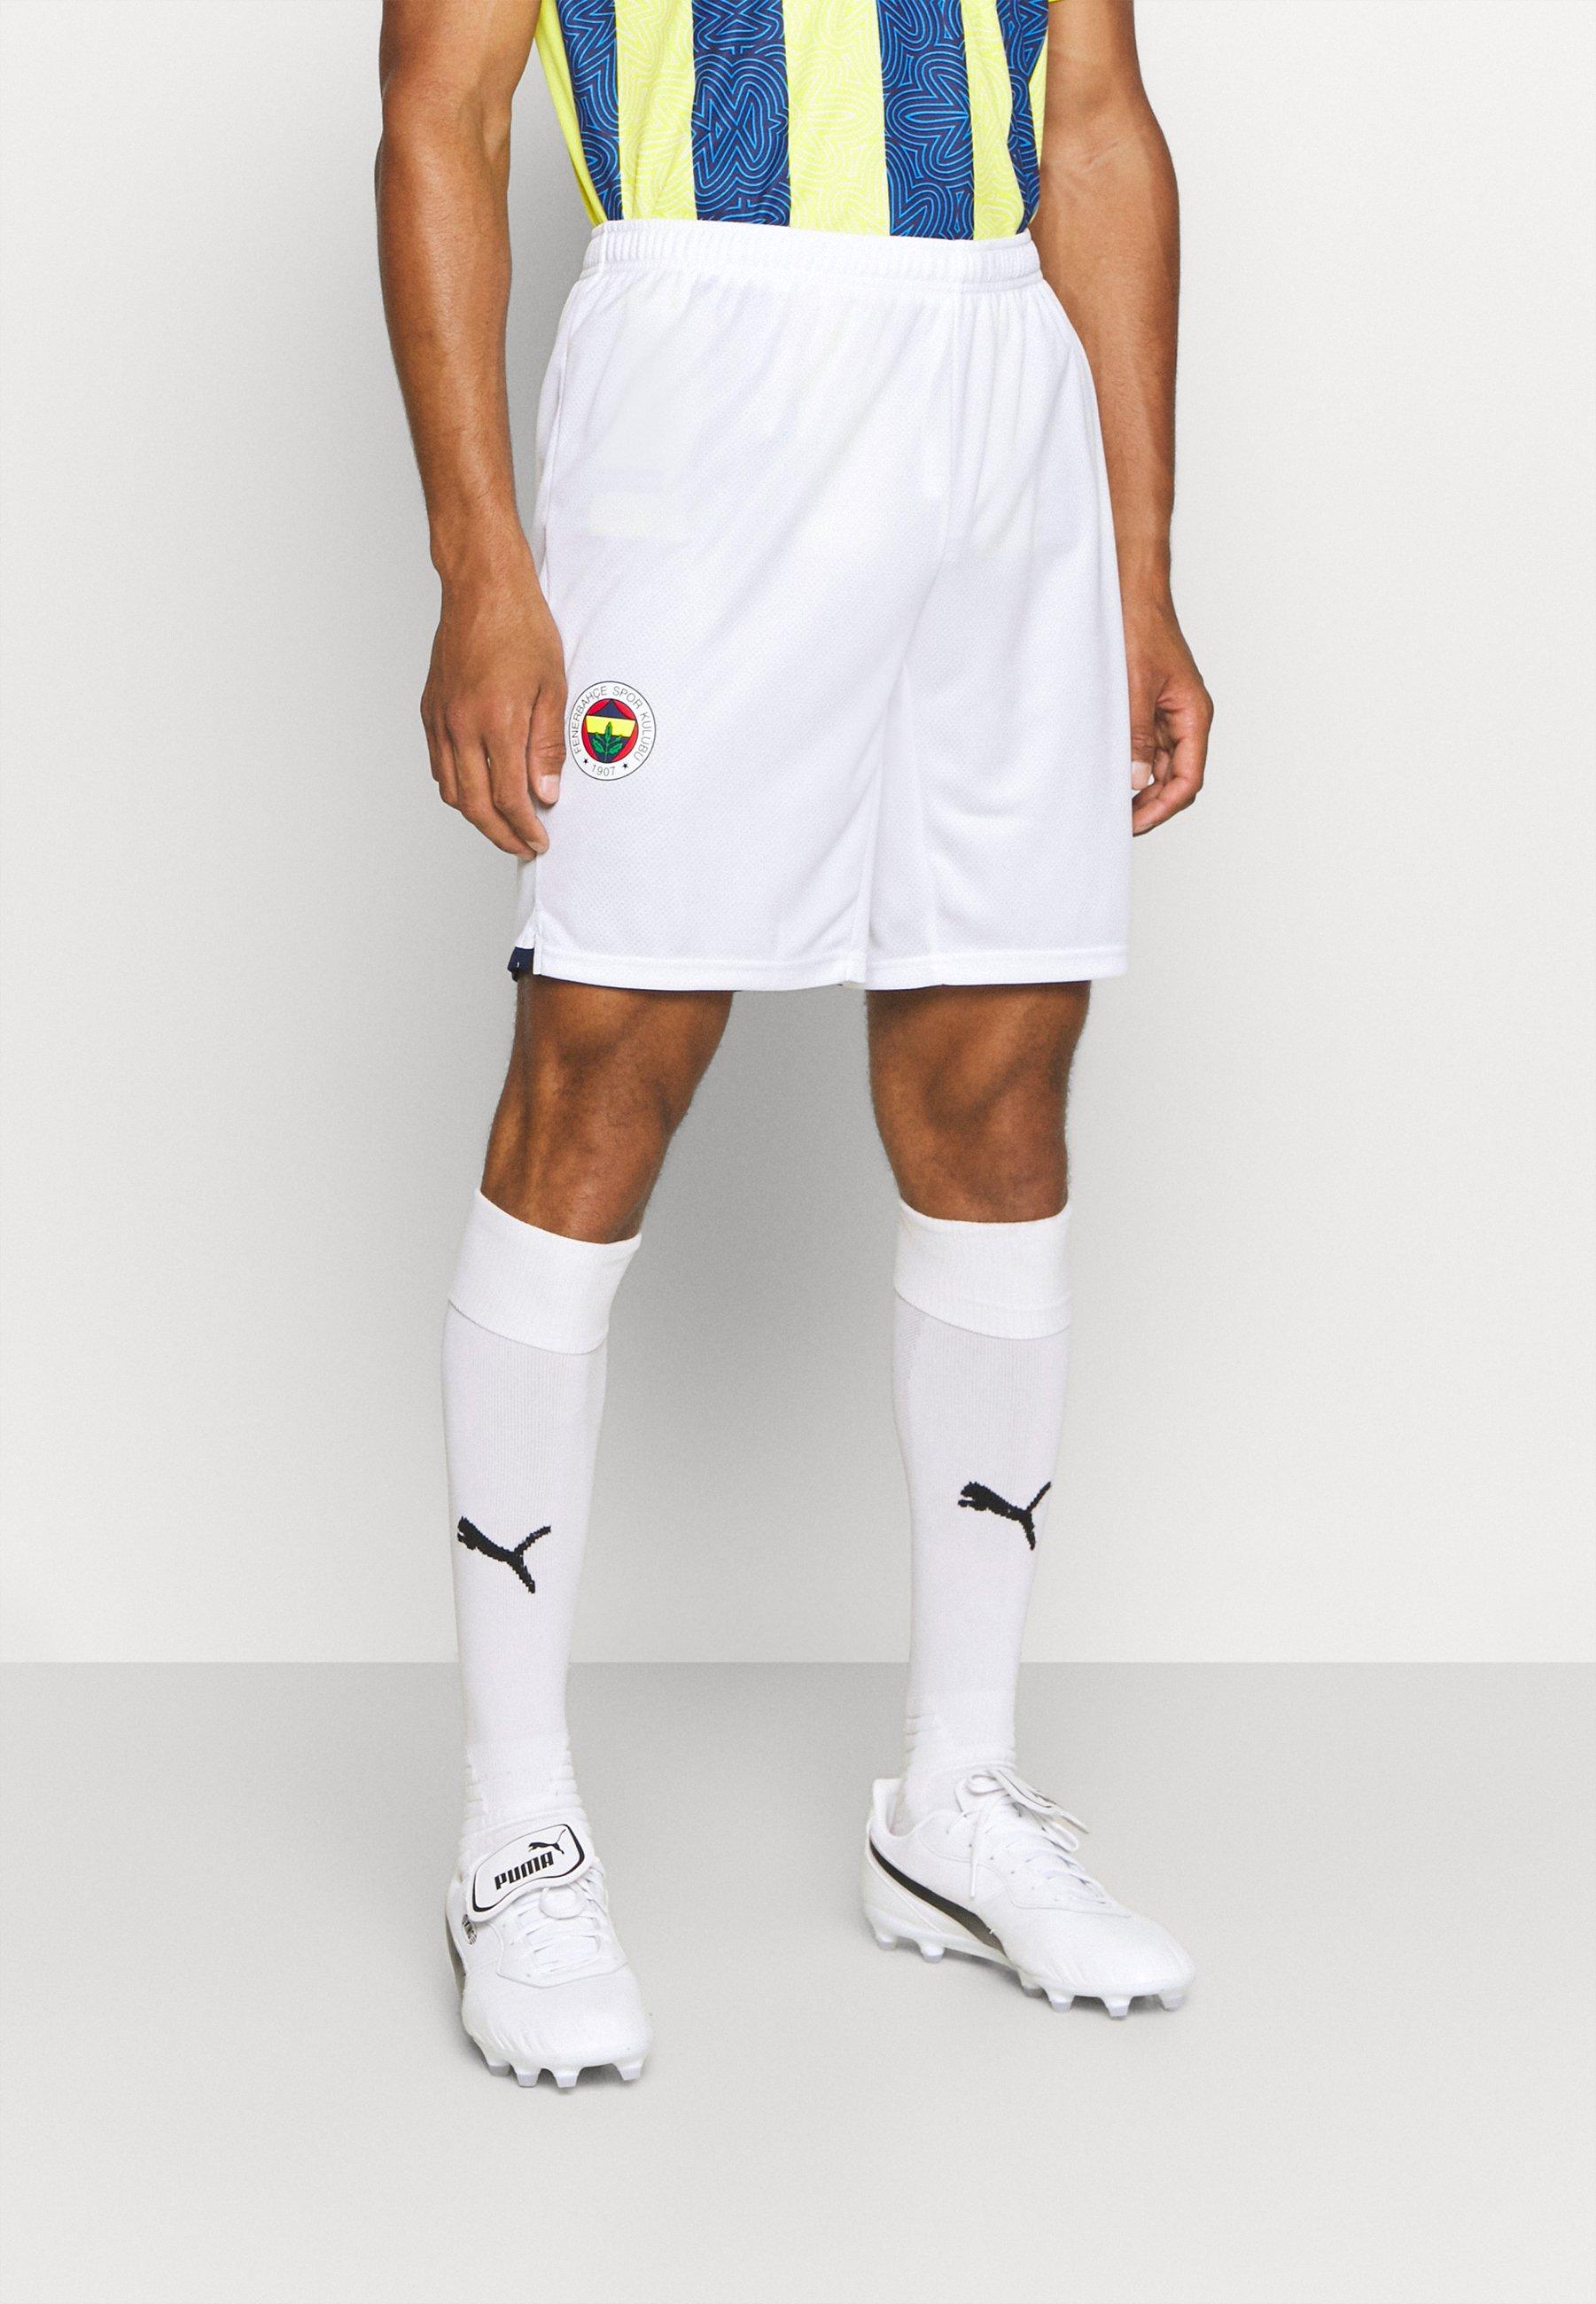 Herren FENERBAHÇE ISTANBUL REPLICA - kurze Sporthose